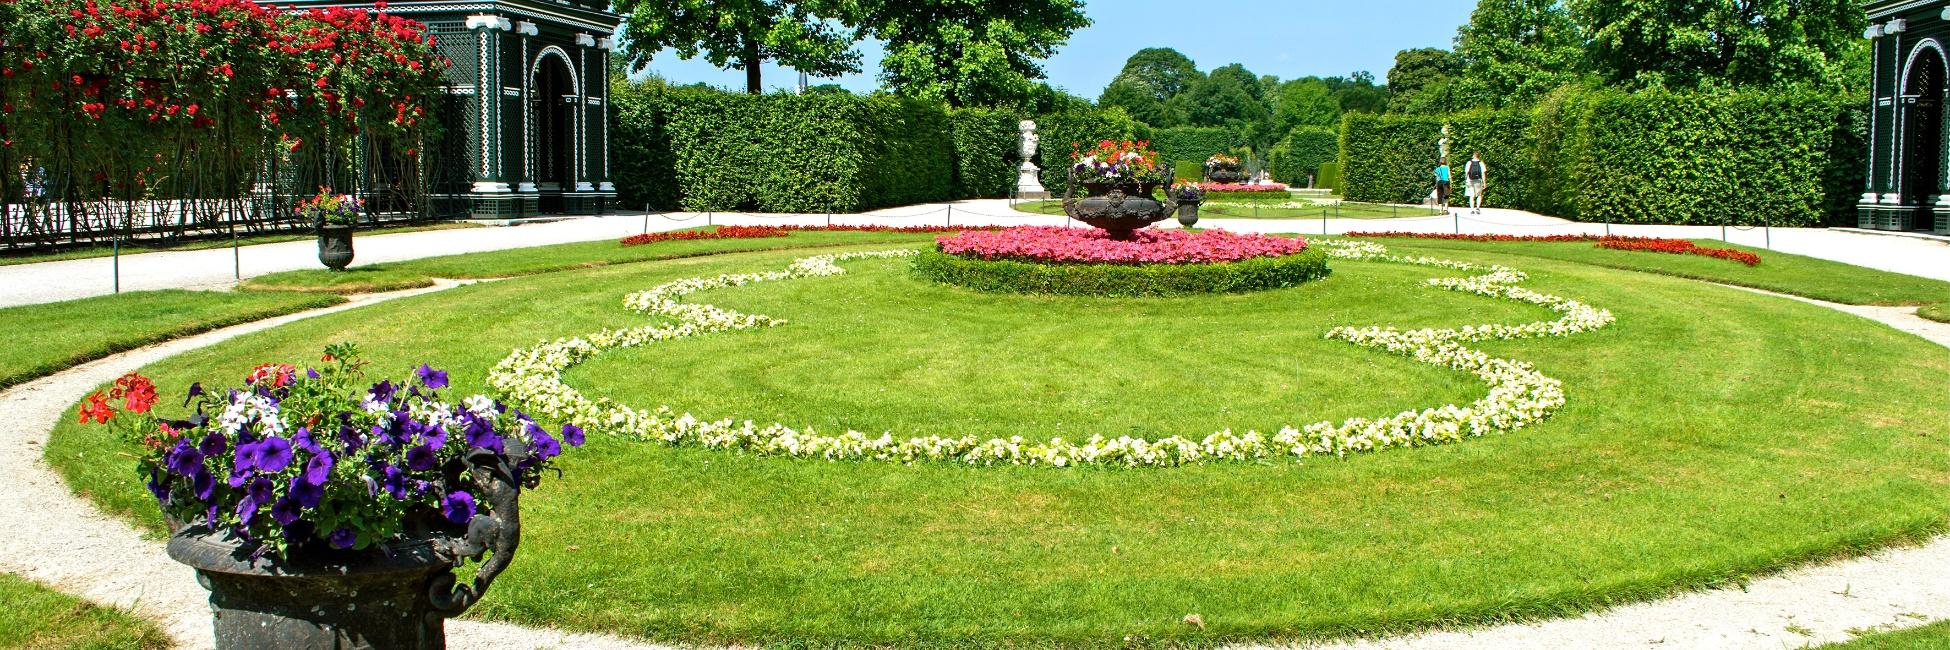 Palais de Schonbrunn en Autriche